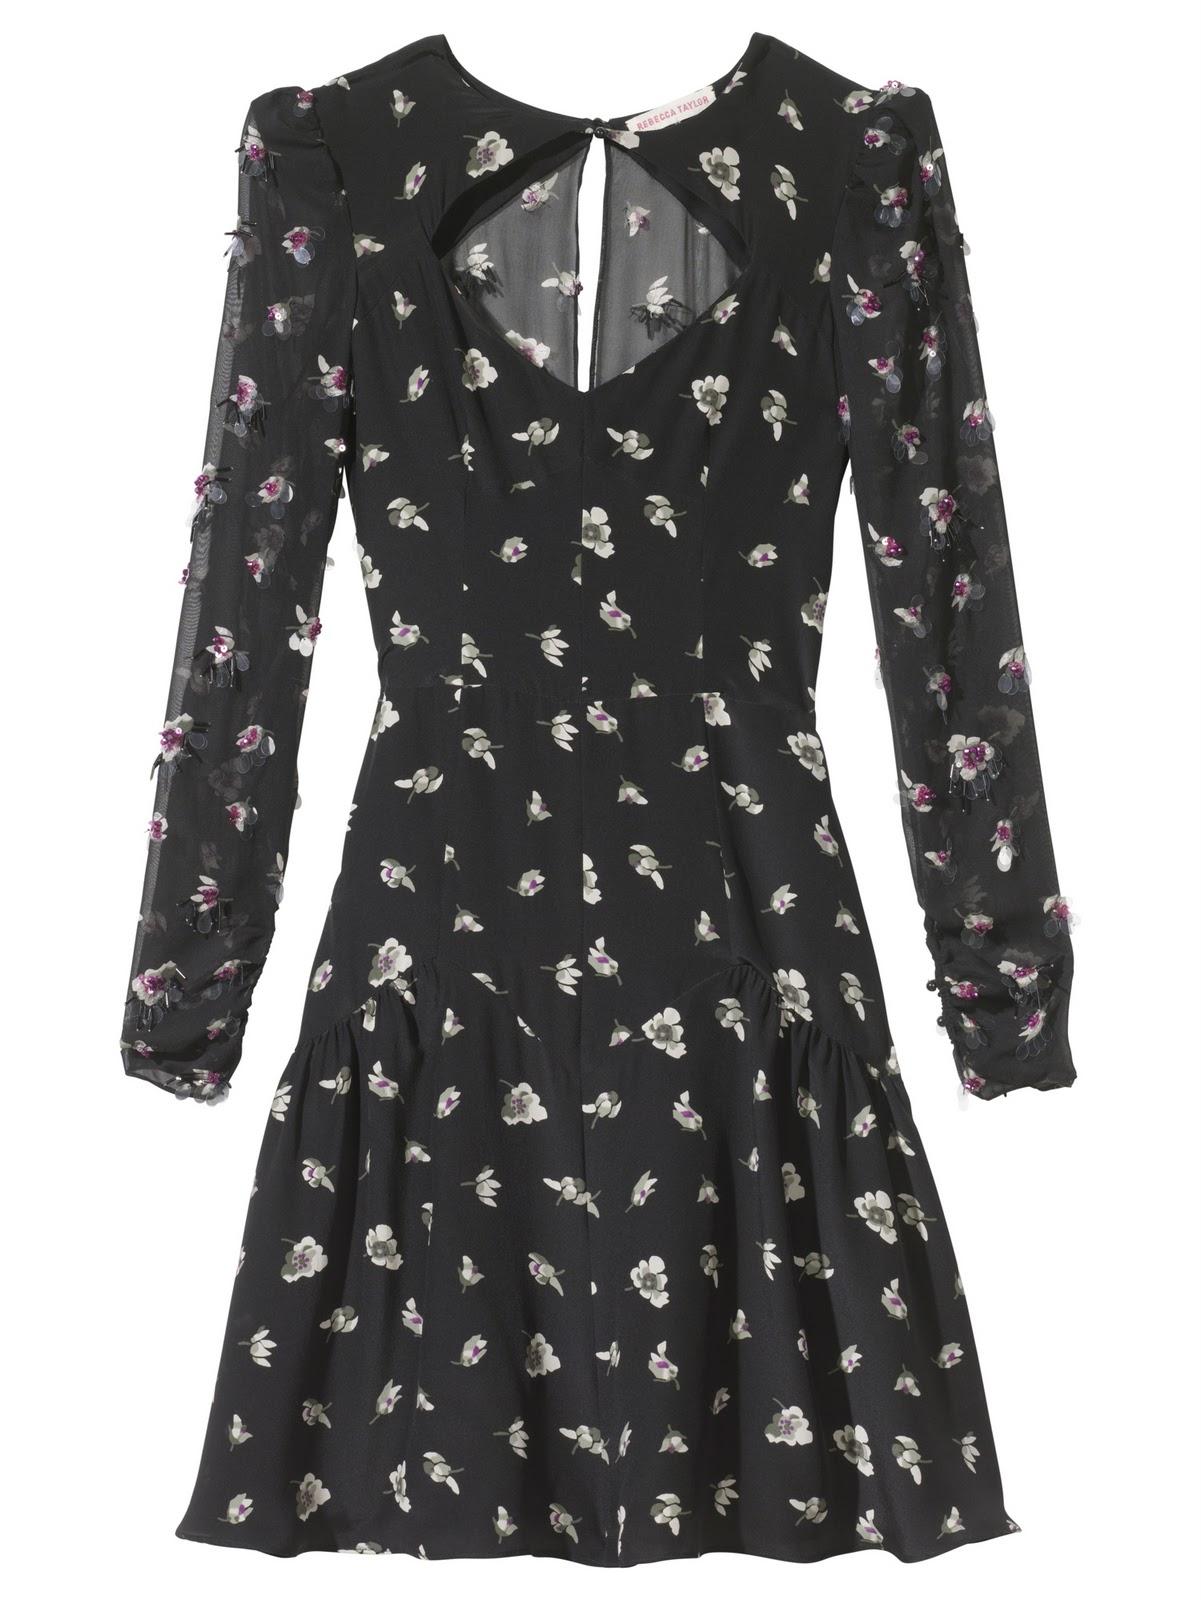 http://3.bp.blogspot.com/-_Tkd_UdC_to/TqjNH-DhBVI/AAAAAAAAGpY/Wk_s4JDbcH0/s1600/Rebecca+Taylor+Ghost+Floral+Cutout+Dress.jpg